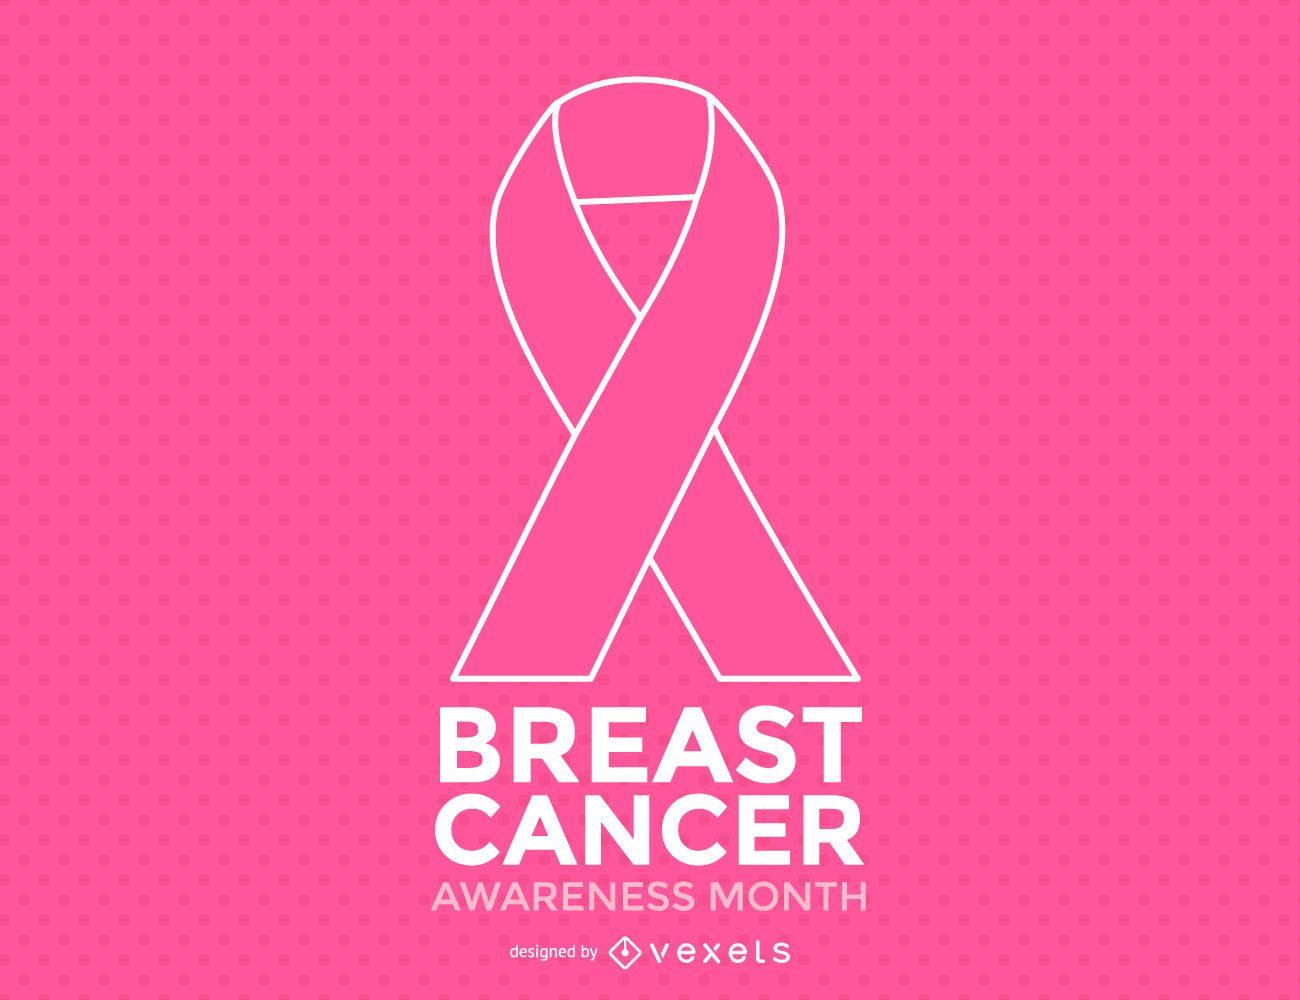 Minimalist Breast Cancer Awareness Month